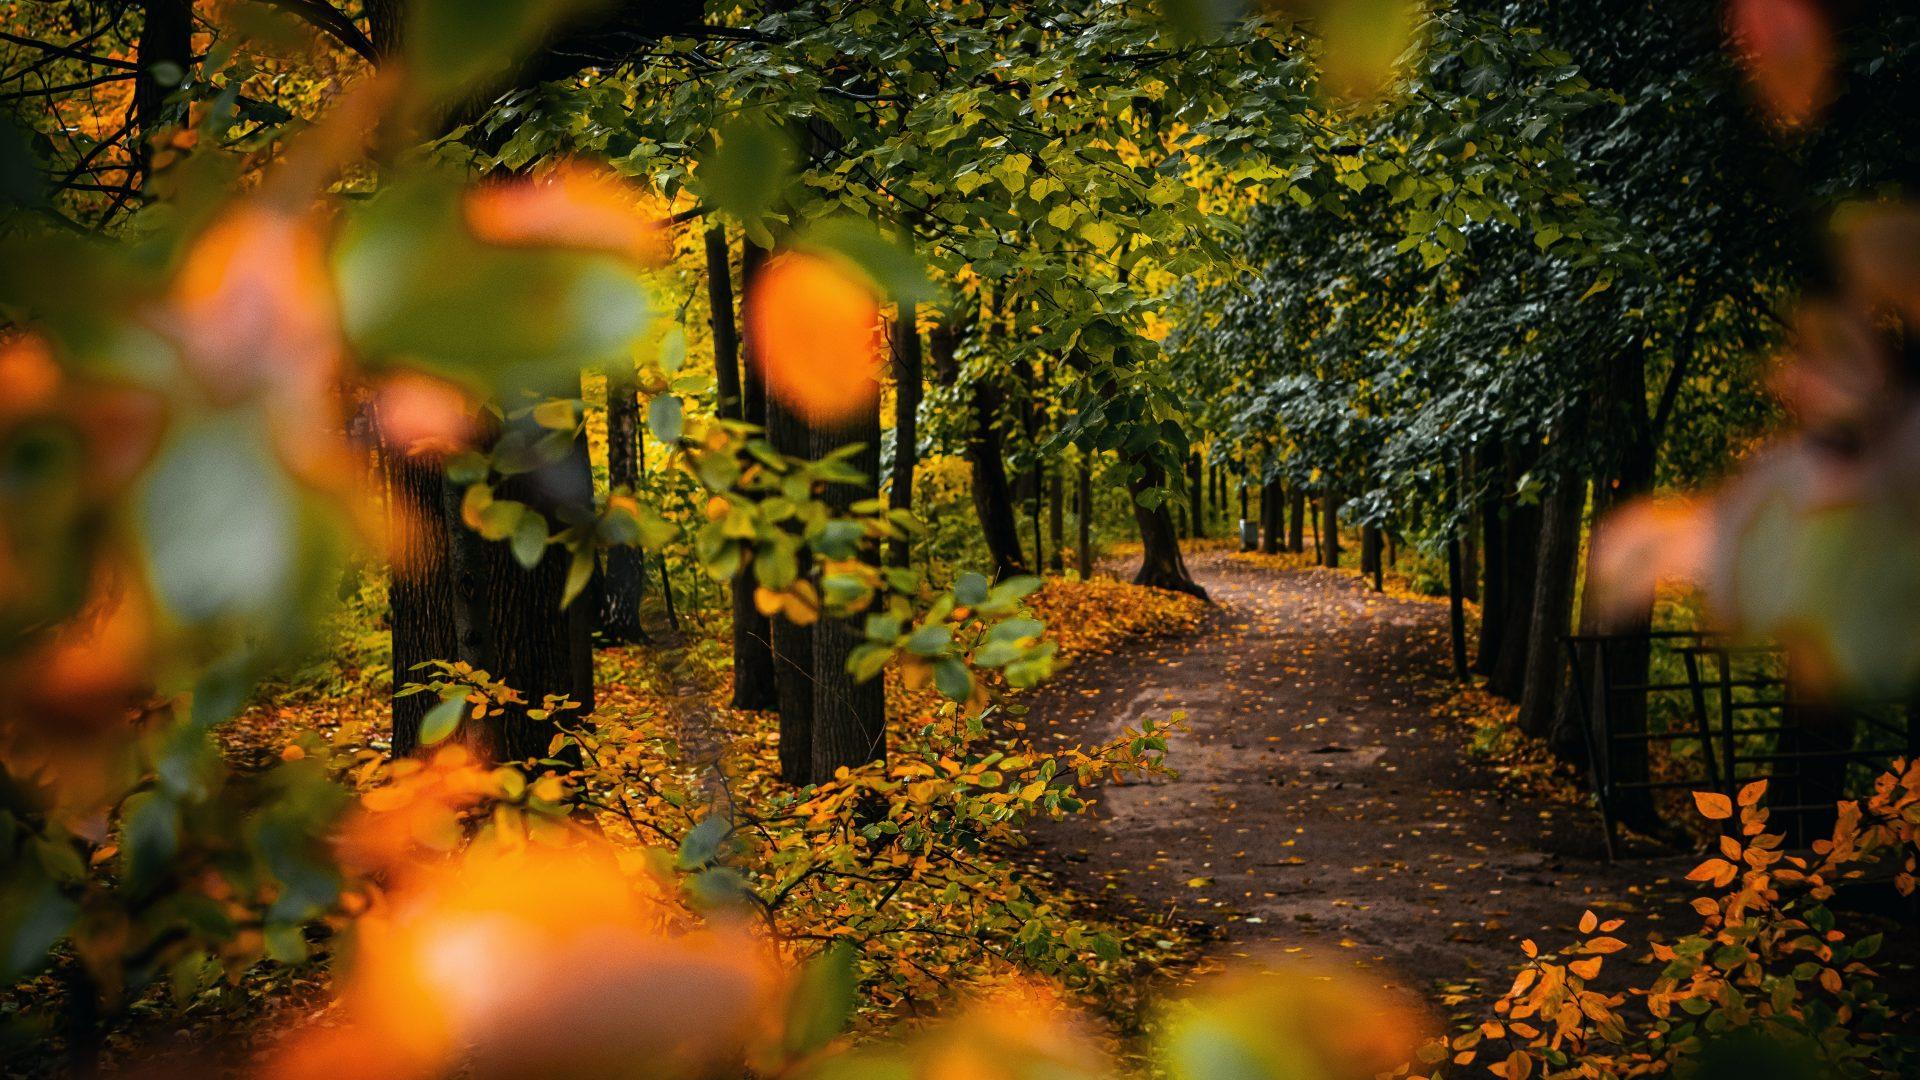 autumn-environment-fall-3119483